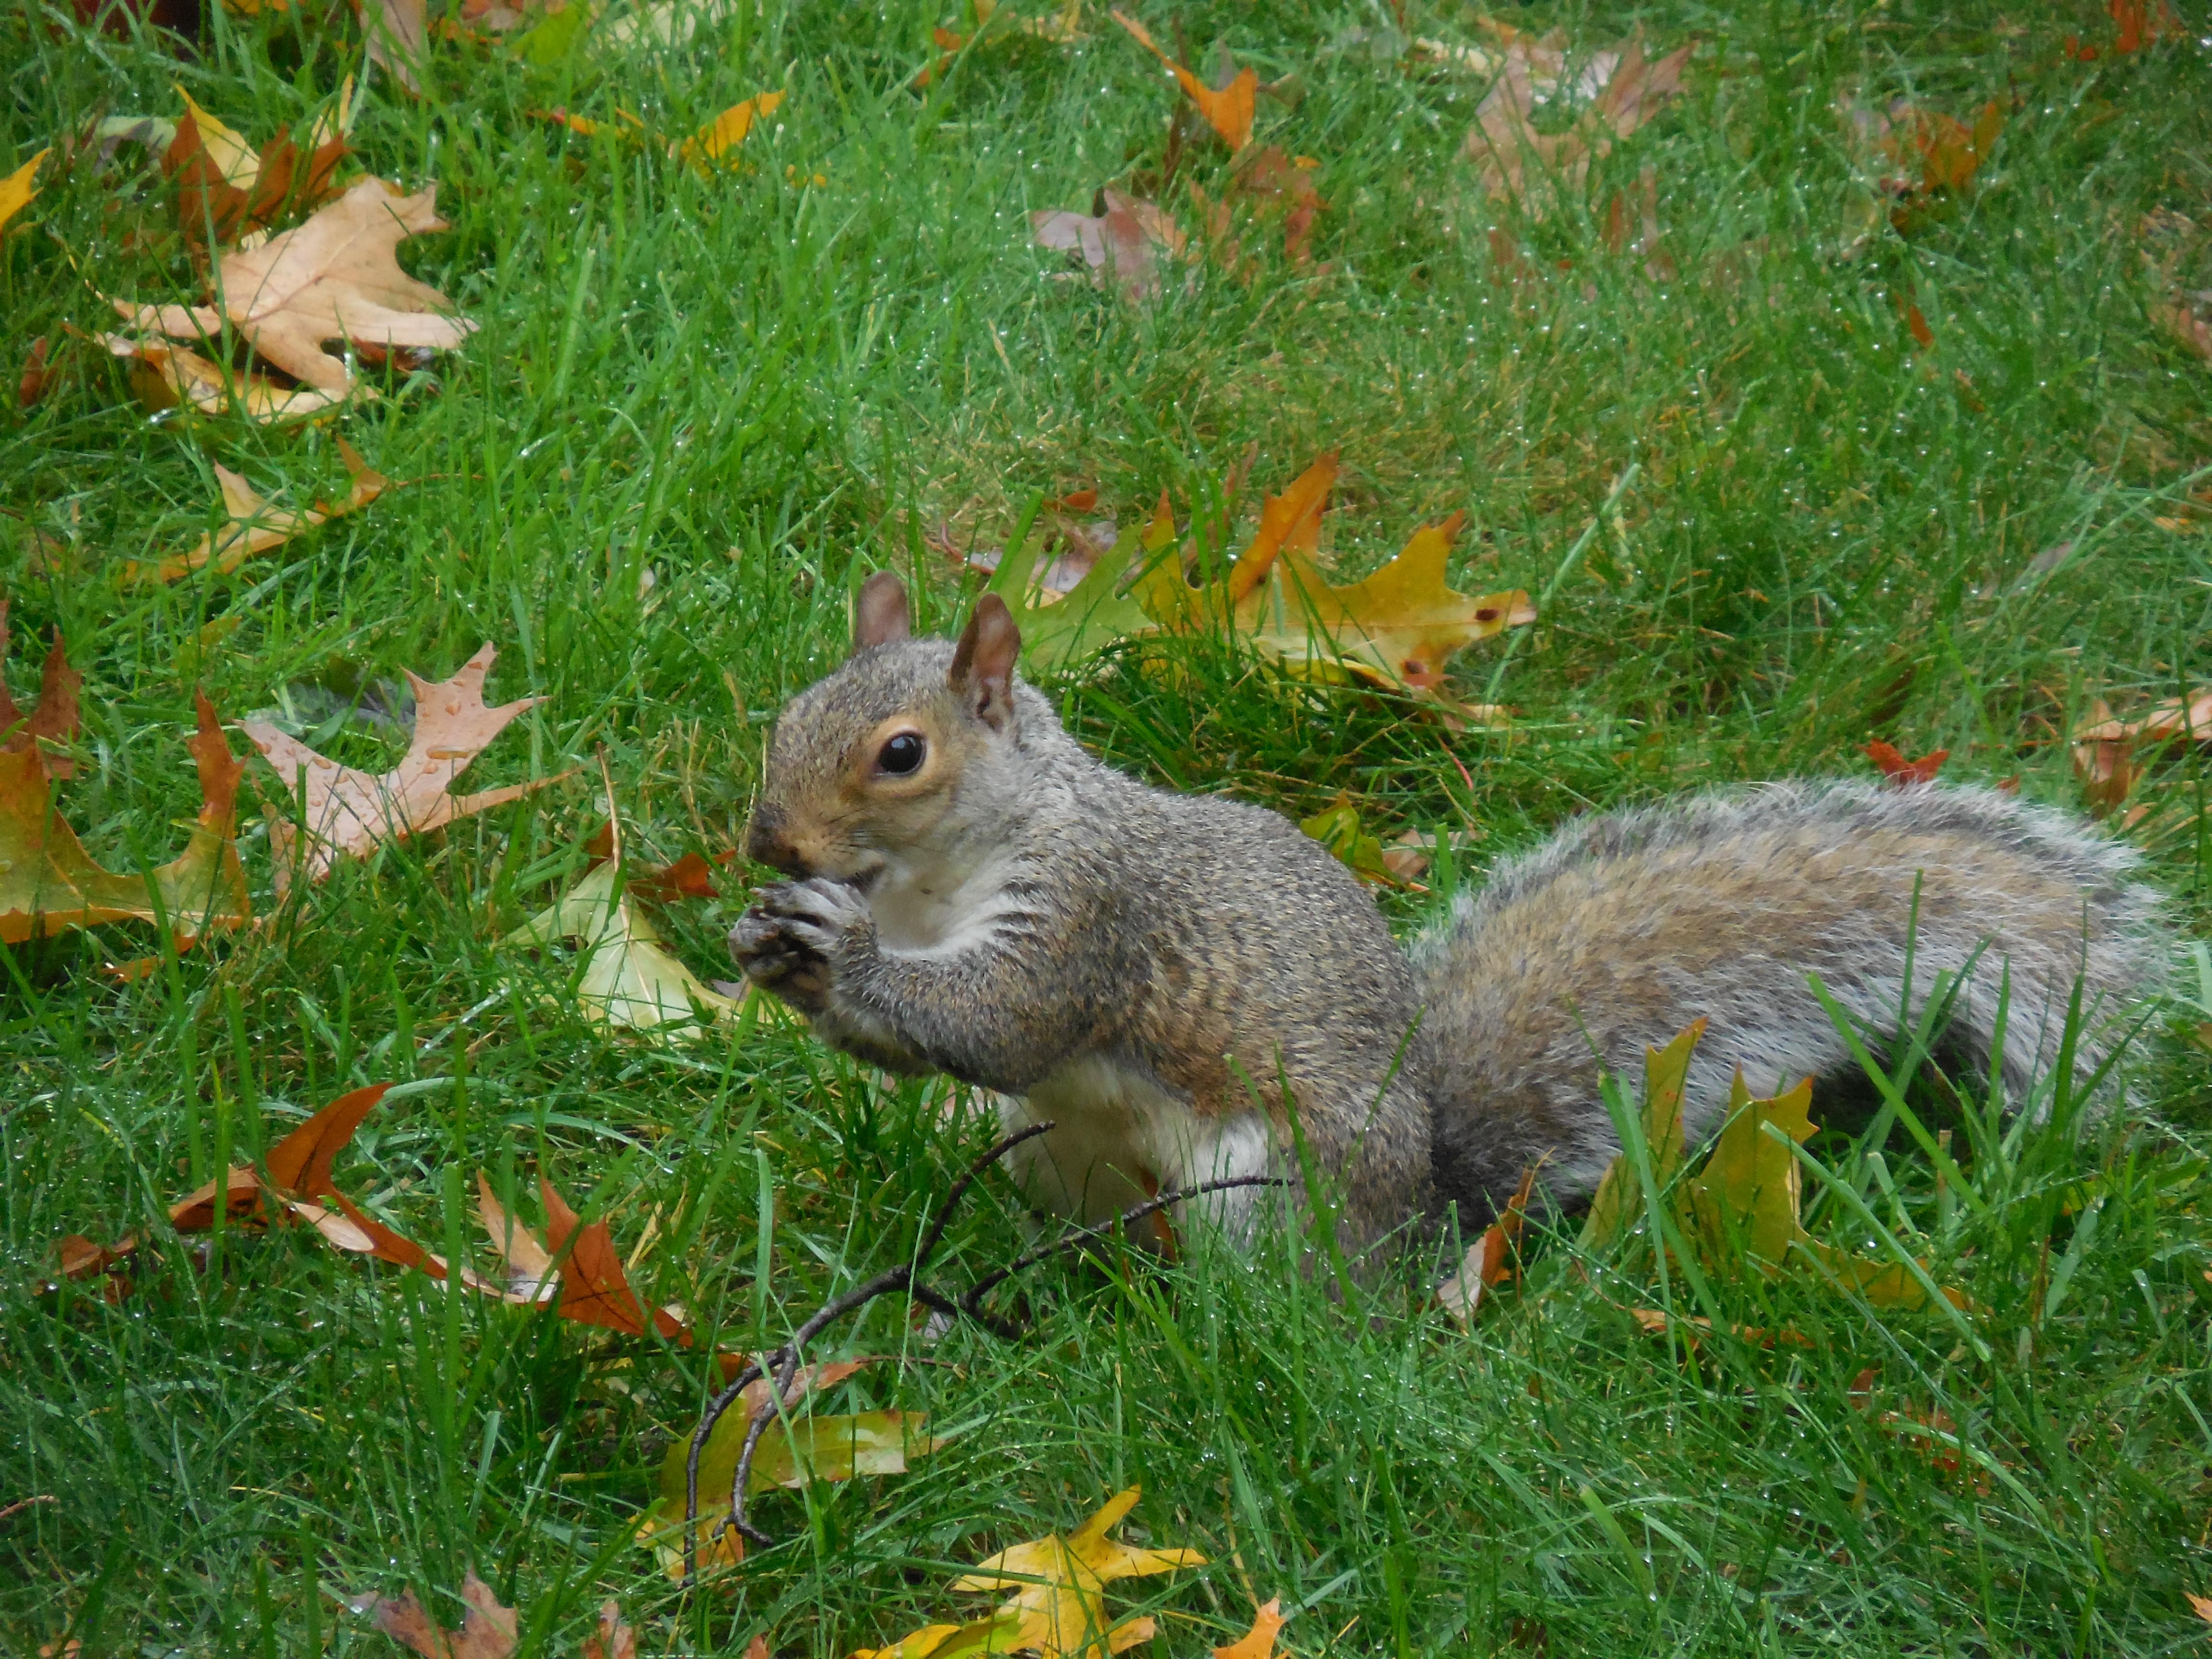 Squirrel work buddy (1)